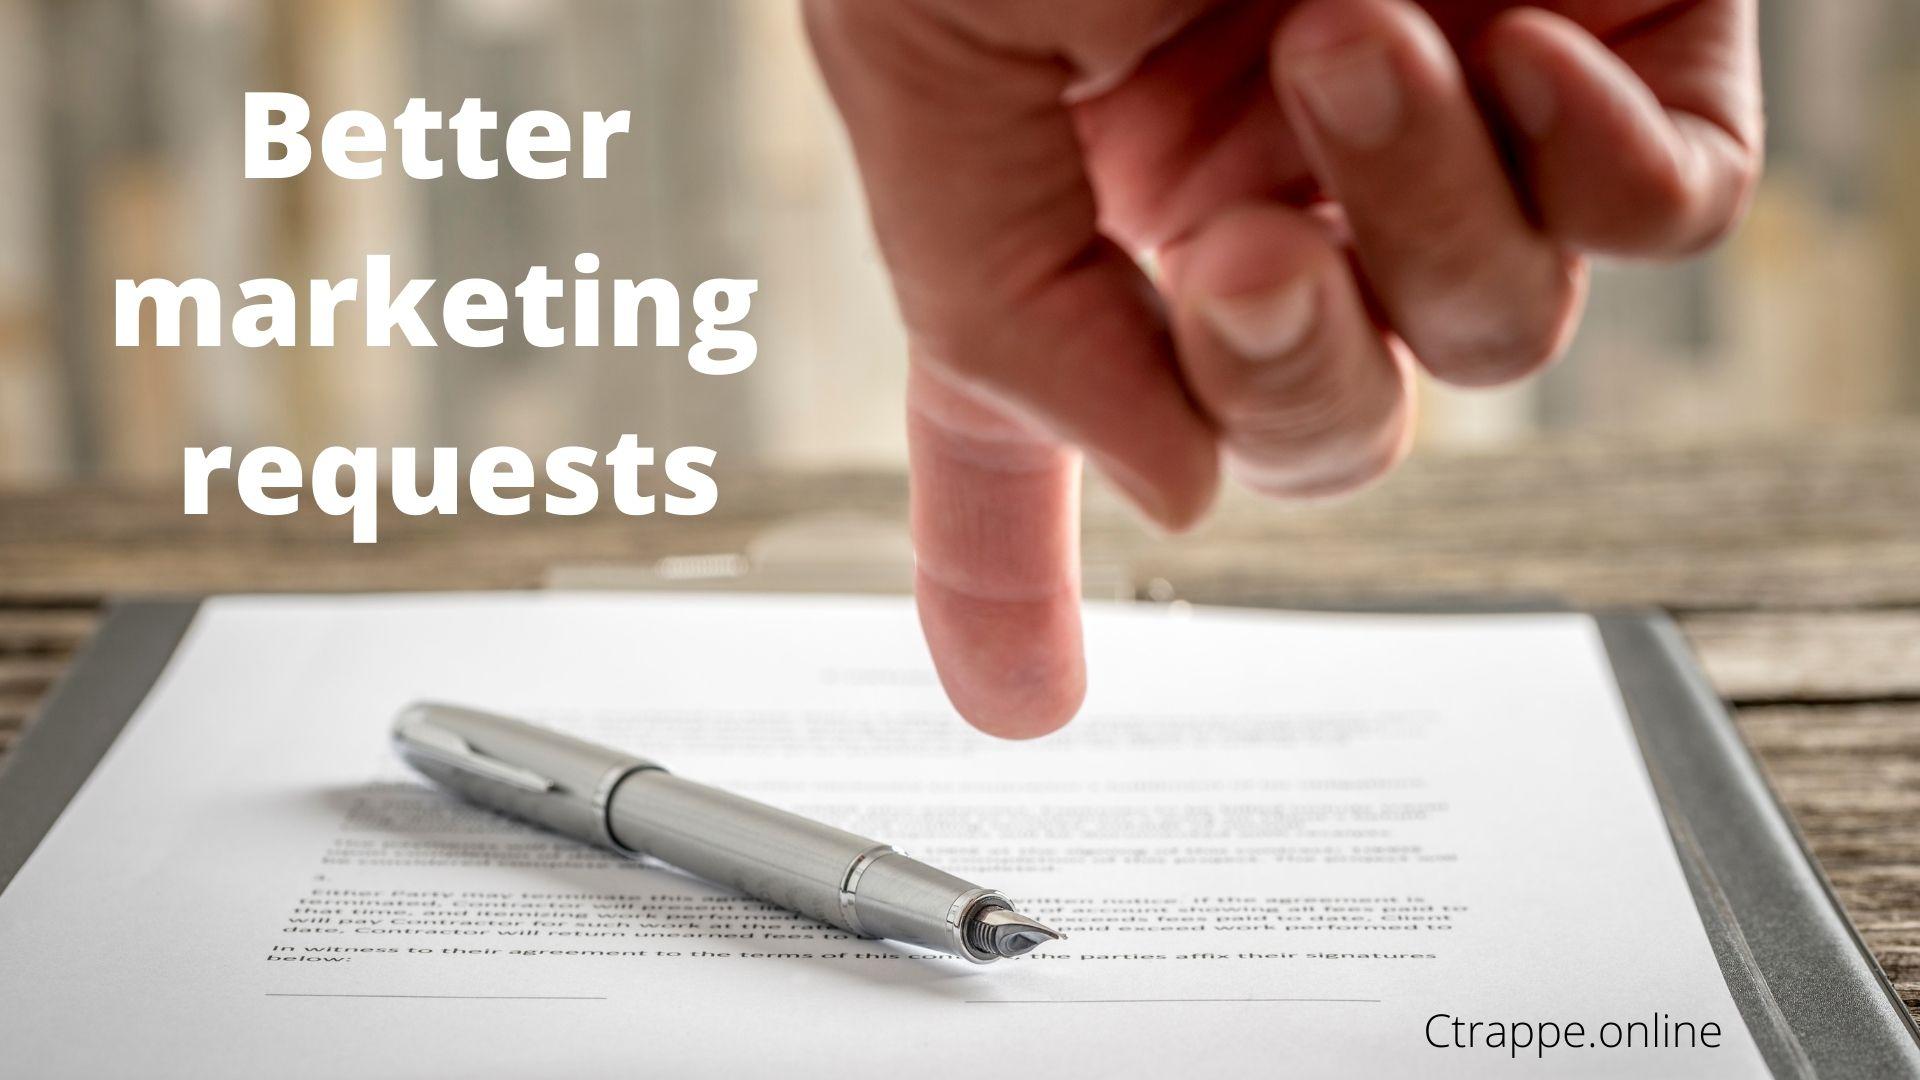 Marketing requests